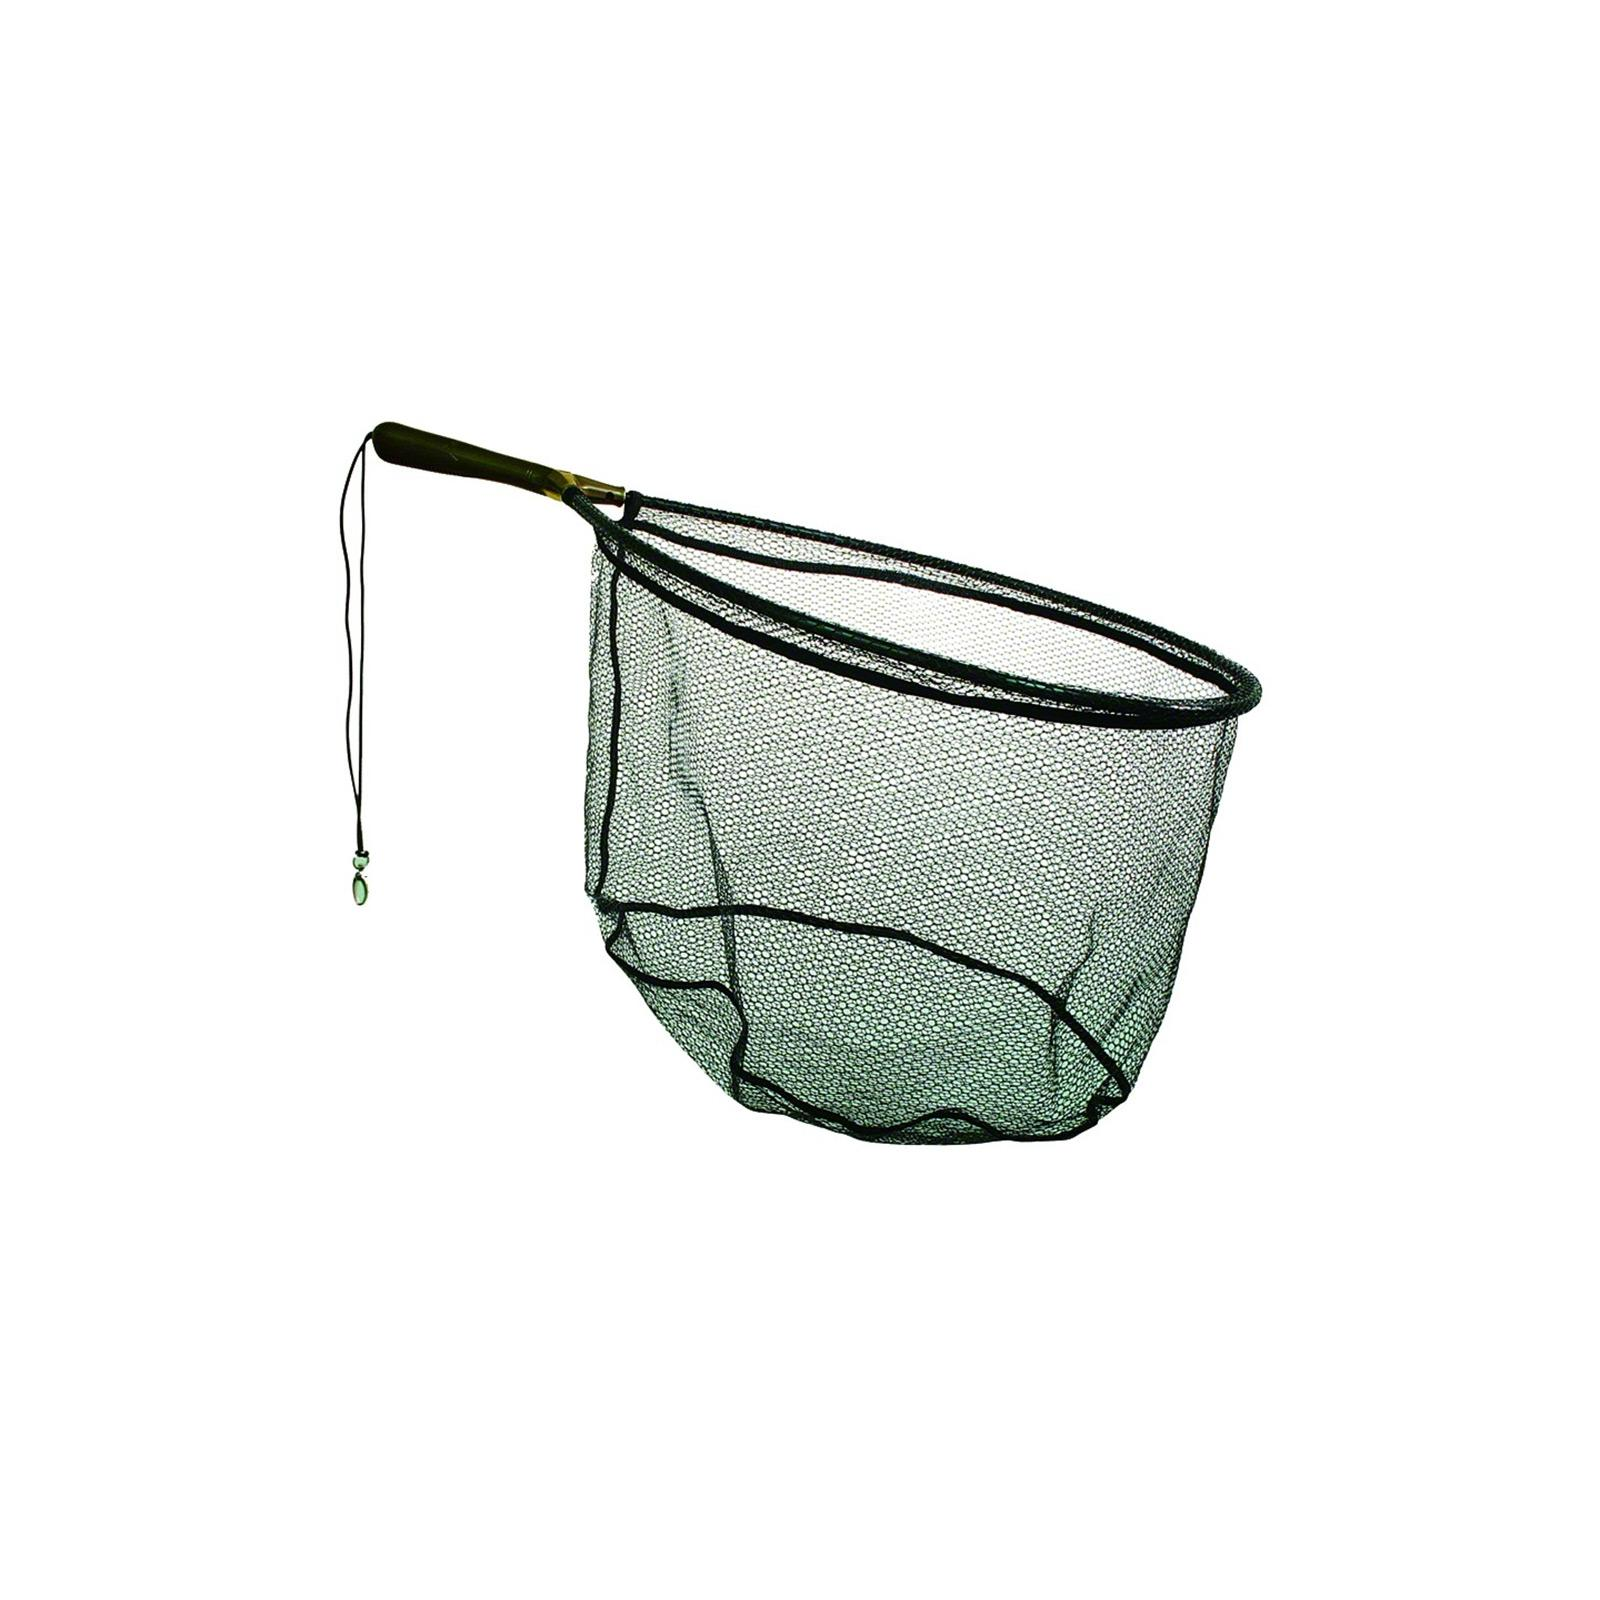 "Frabill Rubber Hndle Trout Net 17X22 Hoop 7-1/2"" Hndl TF,..."